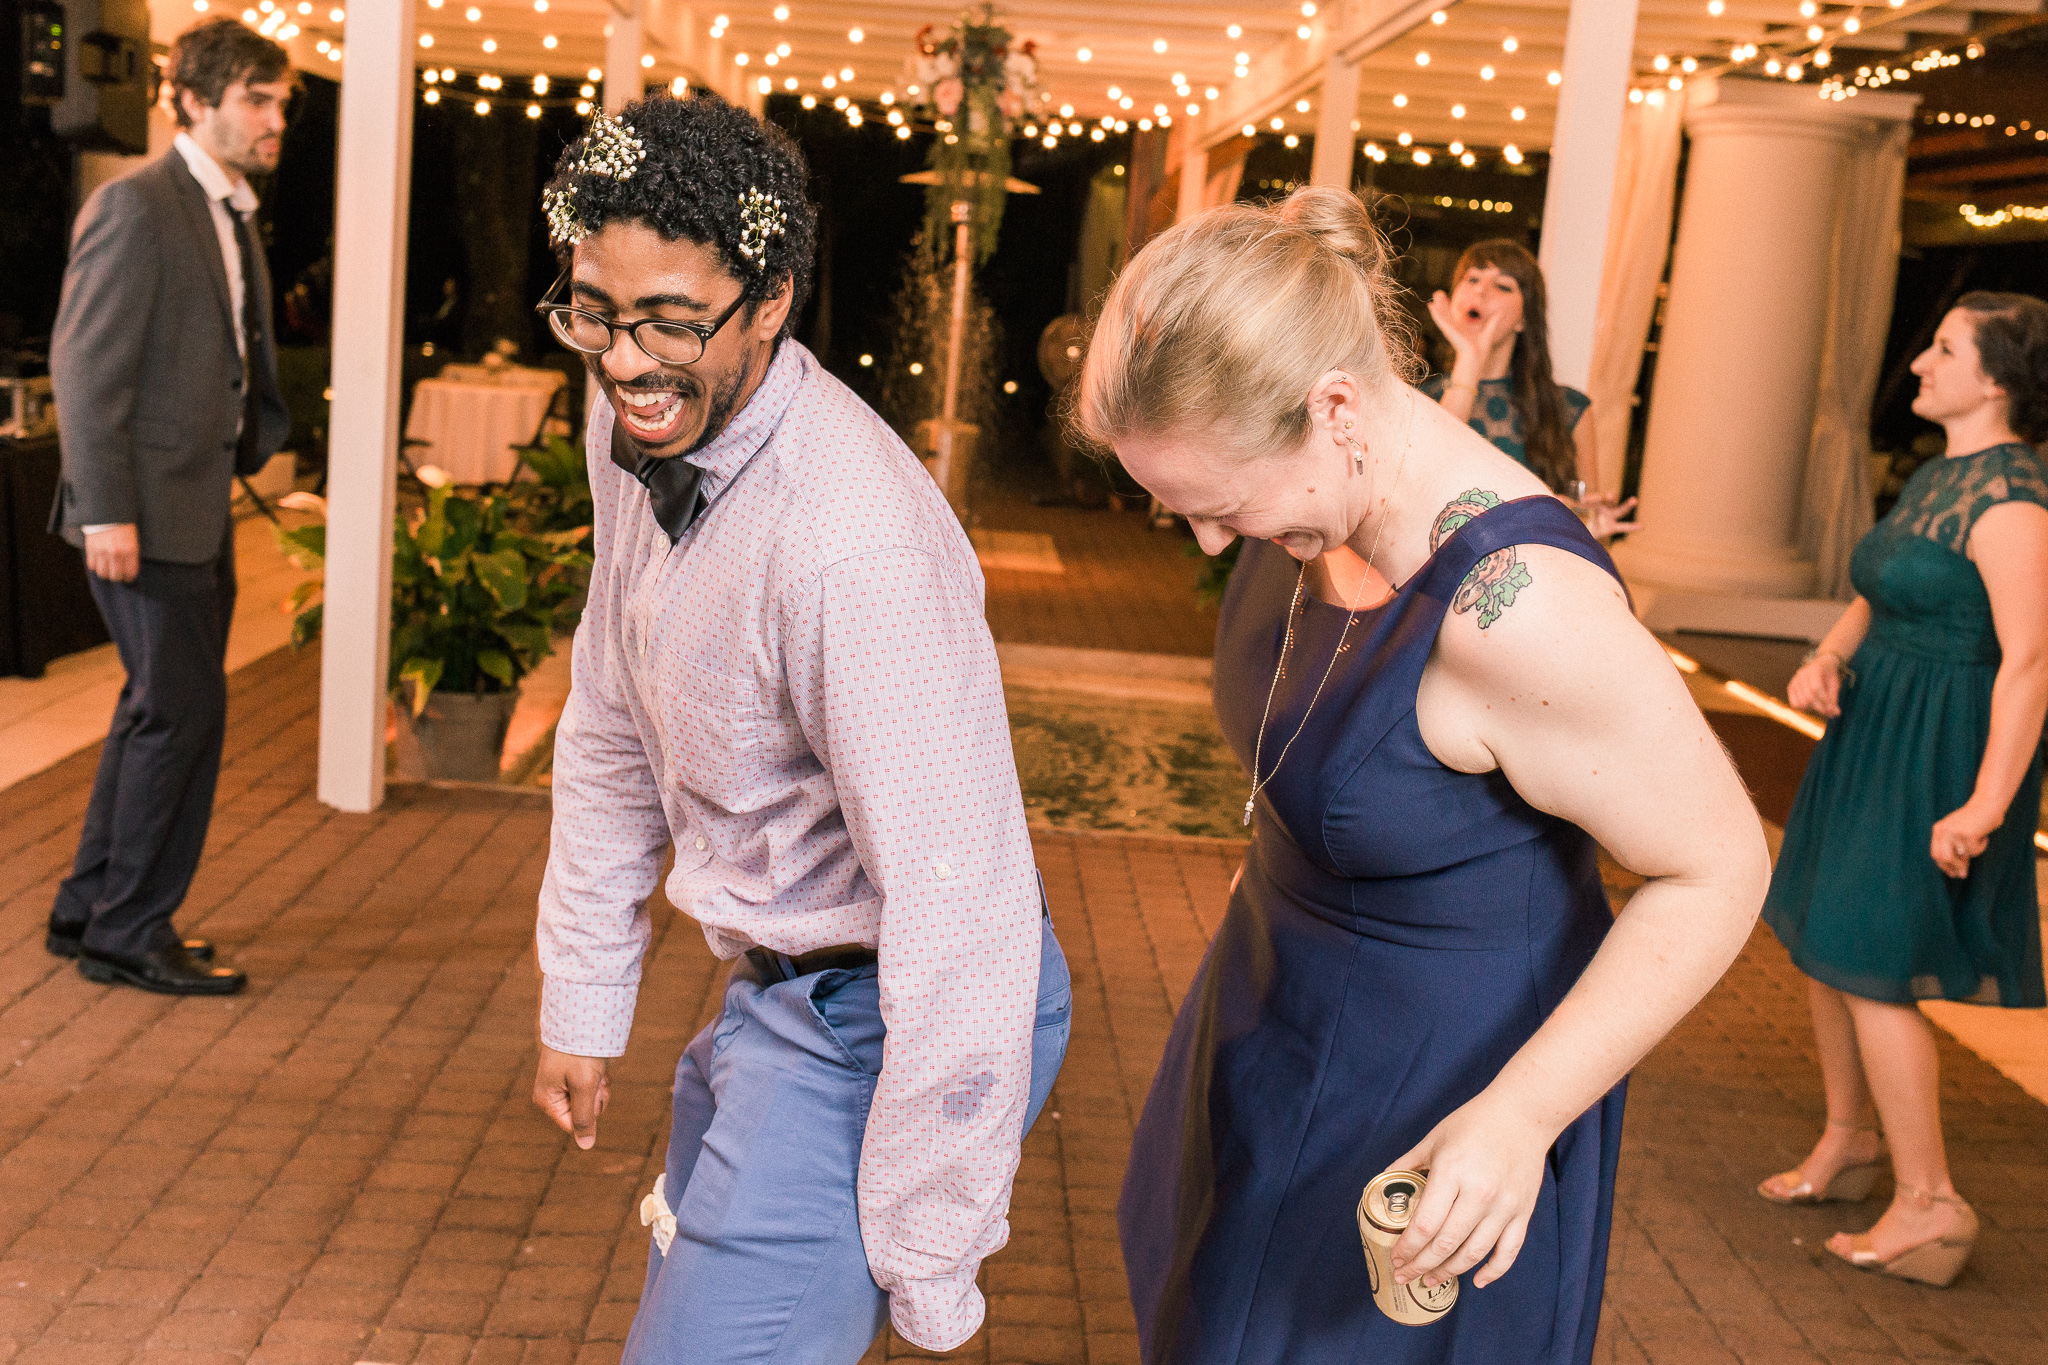 couple-dancing-wedding-reception